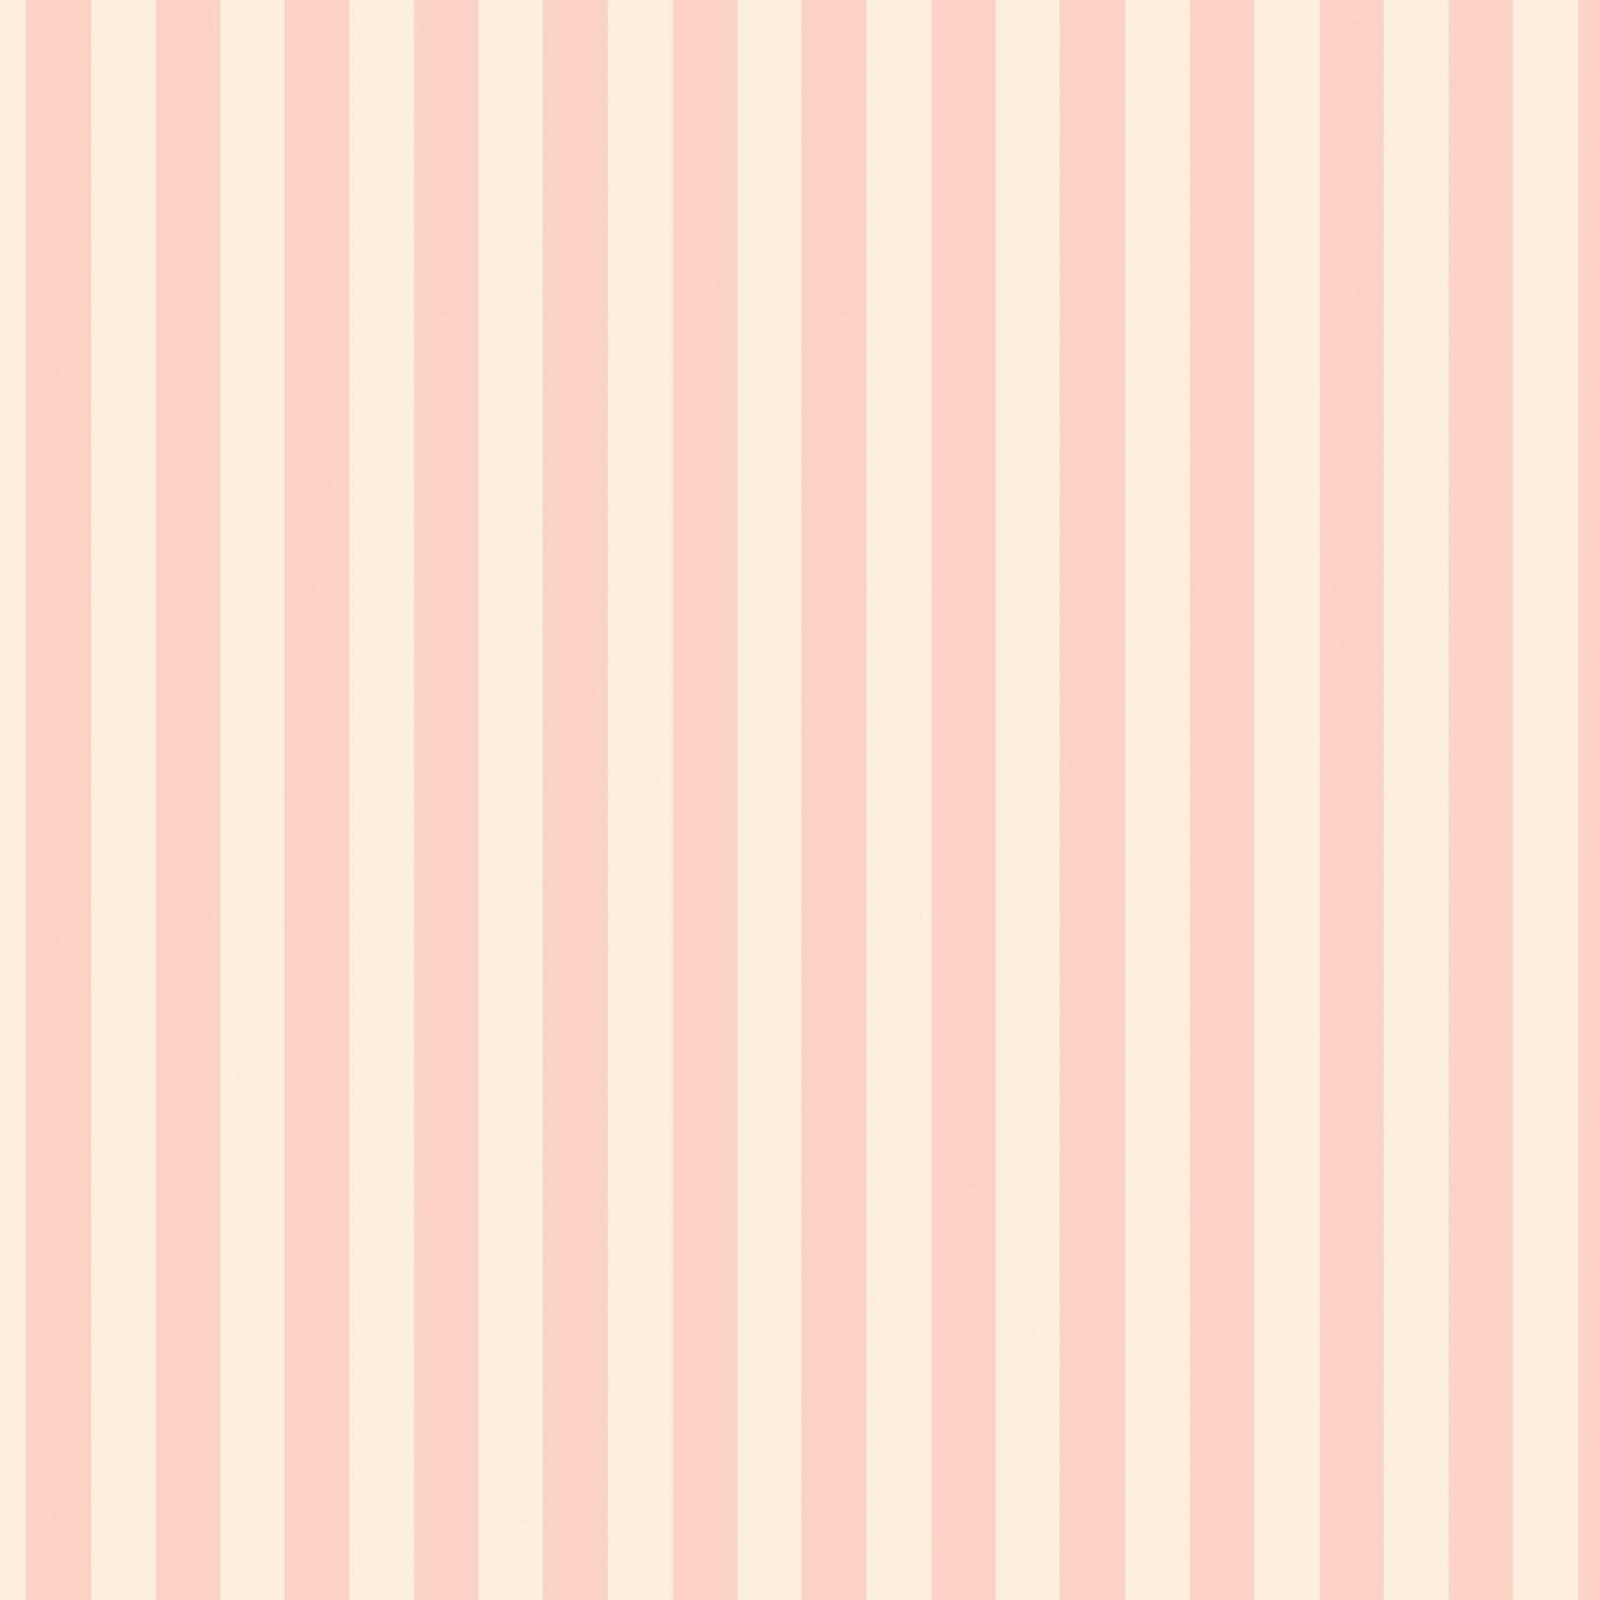 Little Wren Cottage Coordinate - Pink Stripes